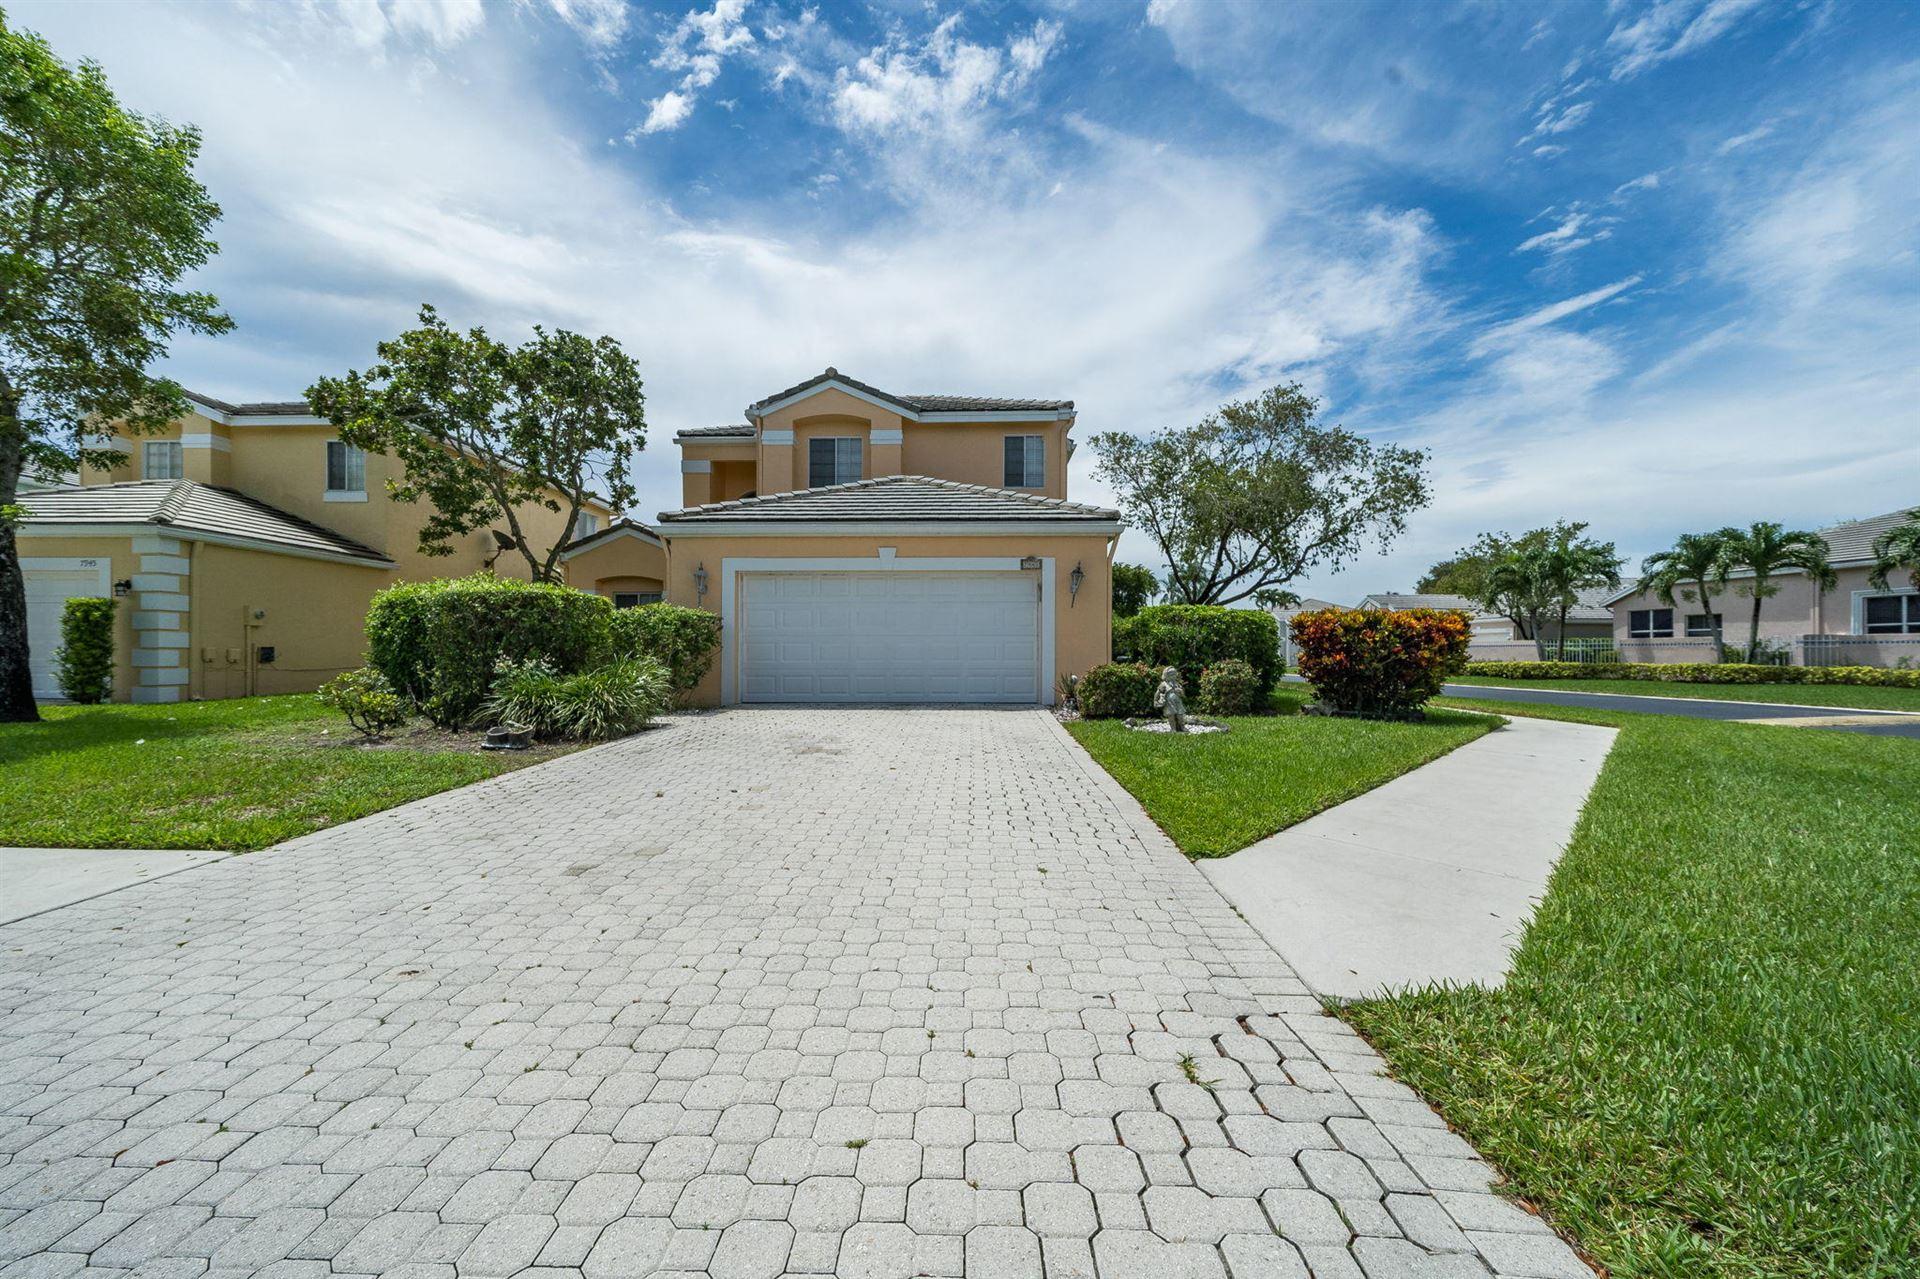 7941 Travlers Tree Drive, Boca Raton, FL 33433 - #: RX-10646519